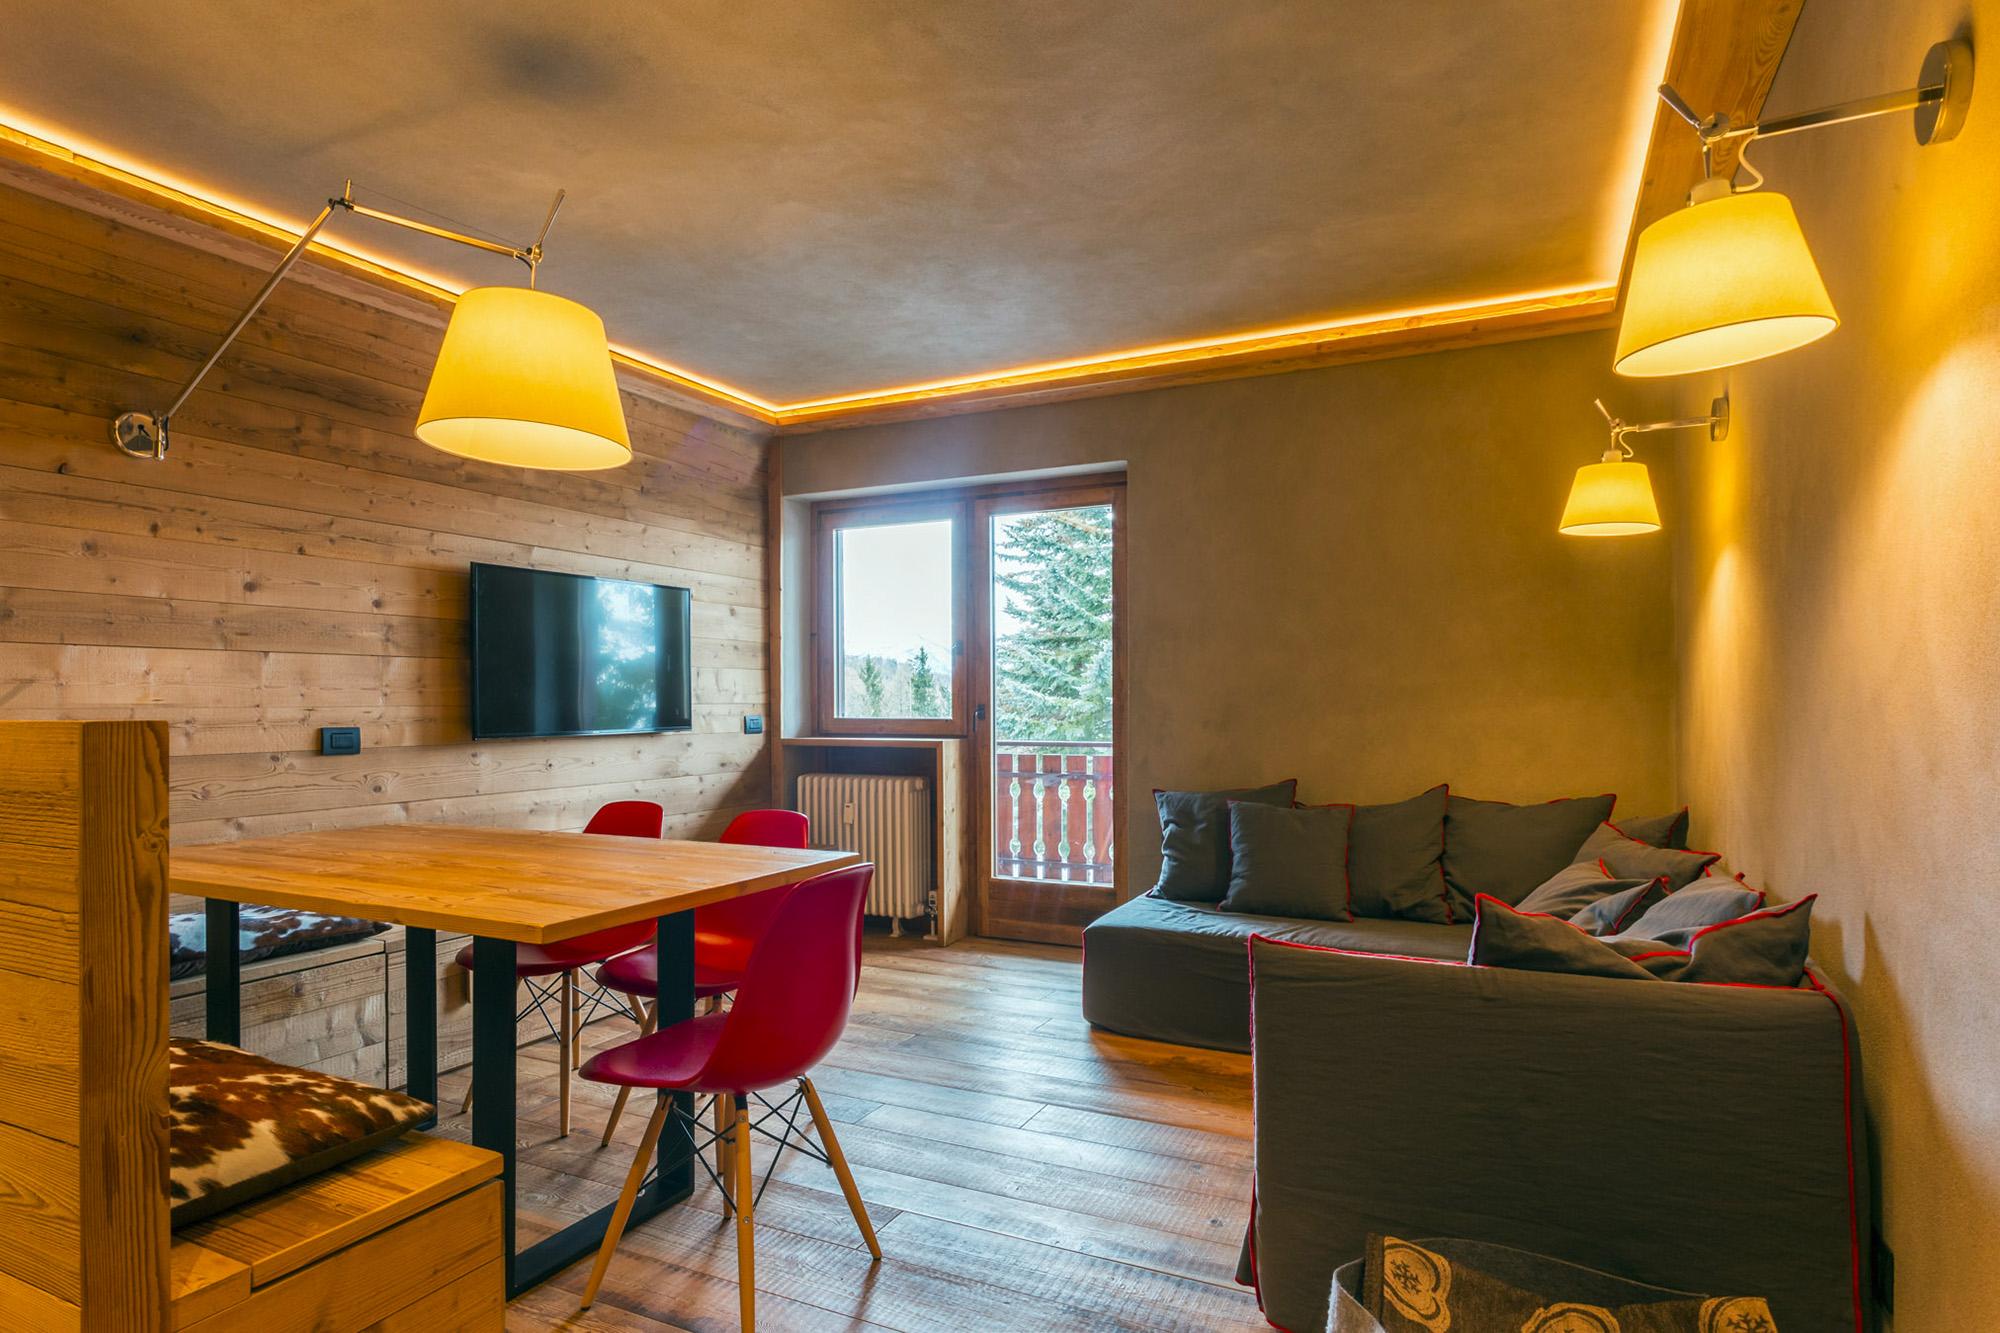 realizazione Design Alpino- Sauze d'Oulx